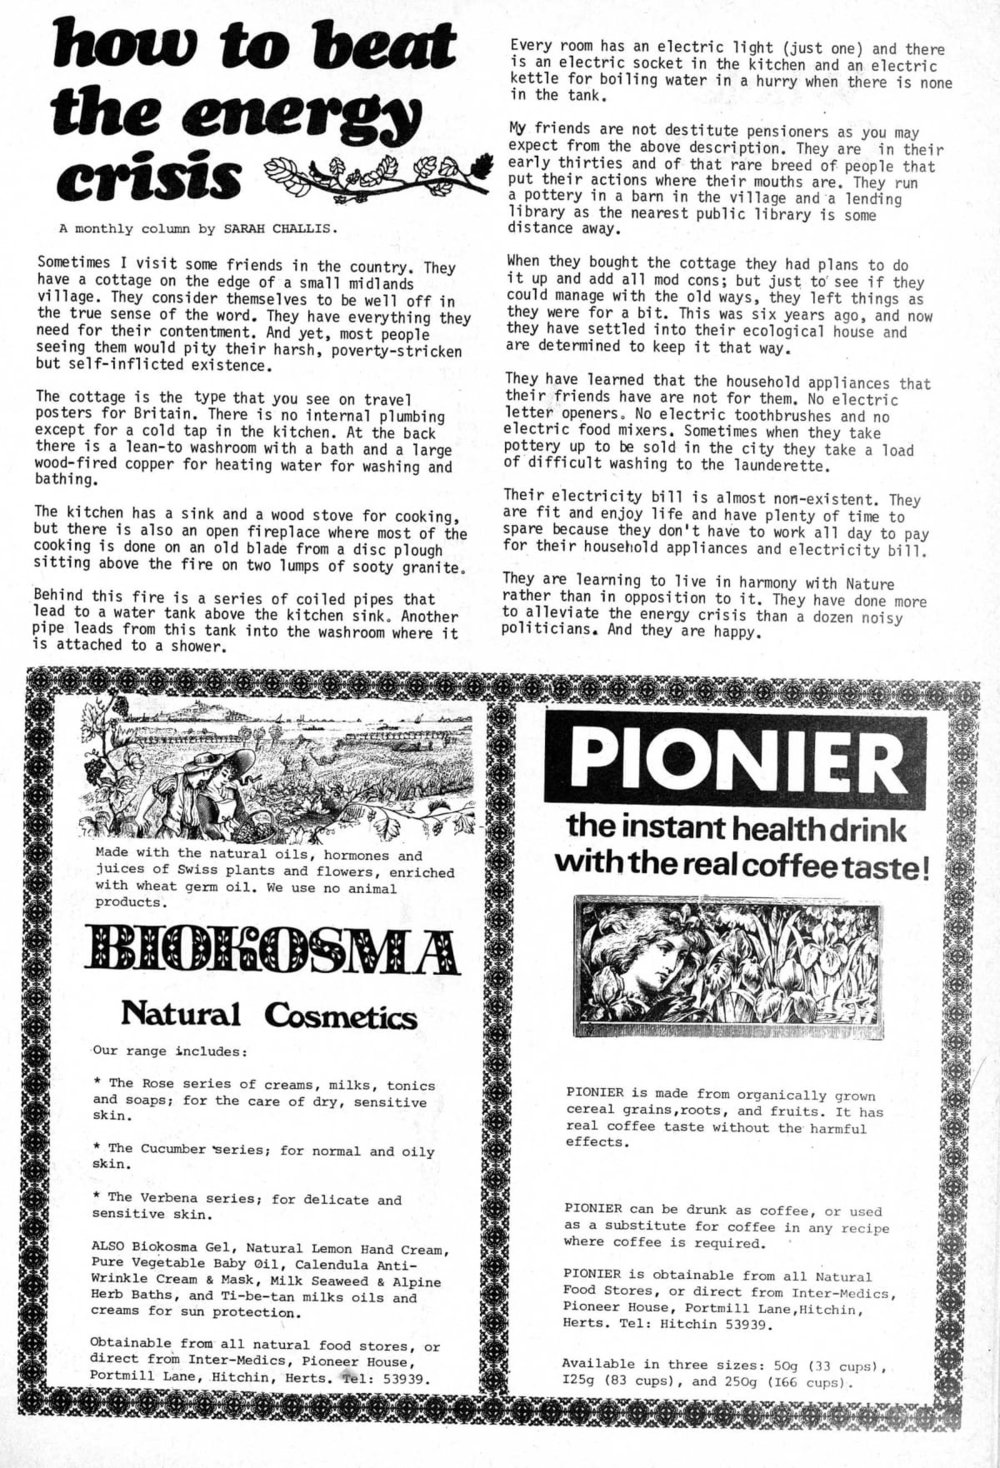 seed-v3-n6-june1974-19.jpg